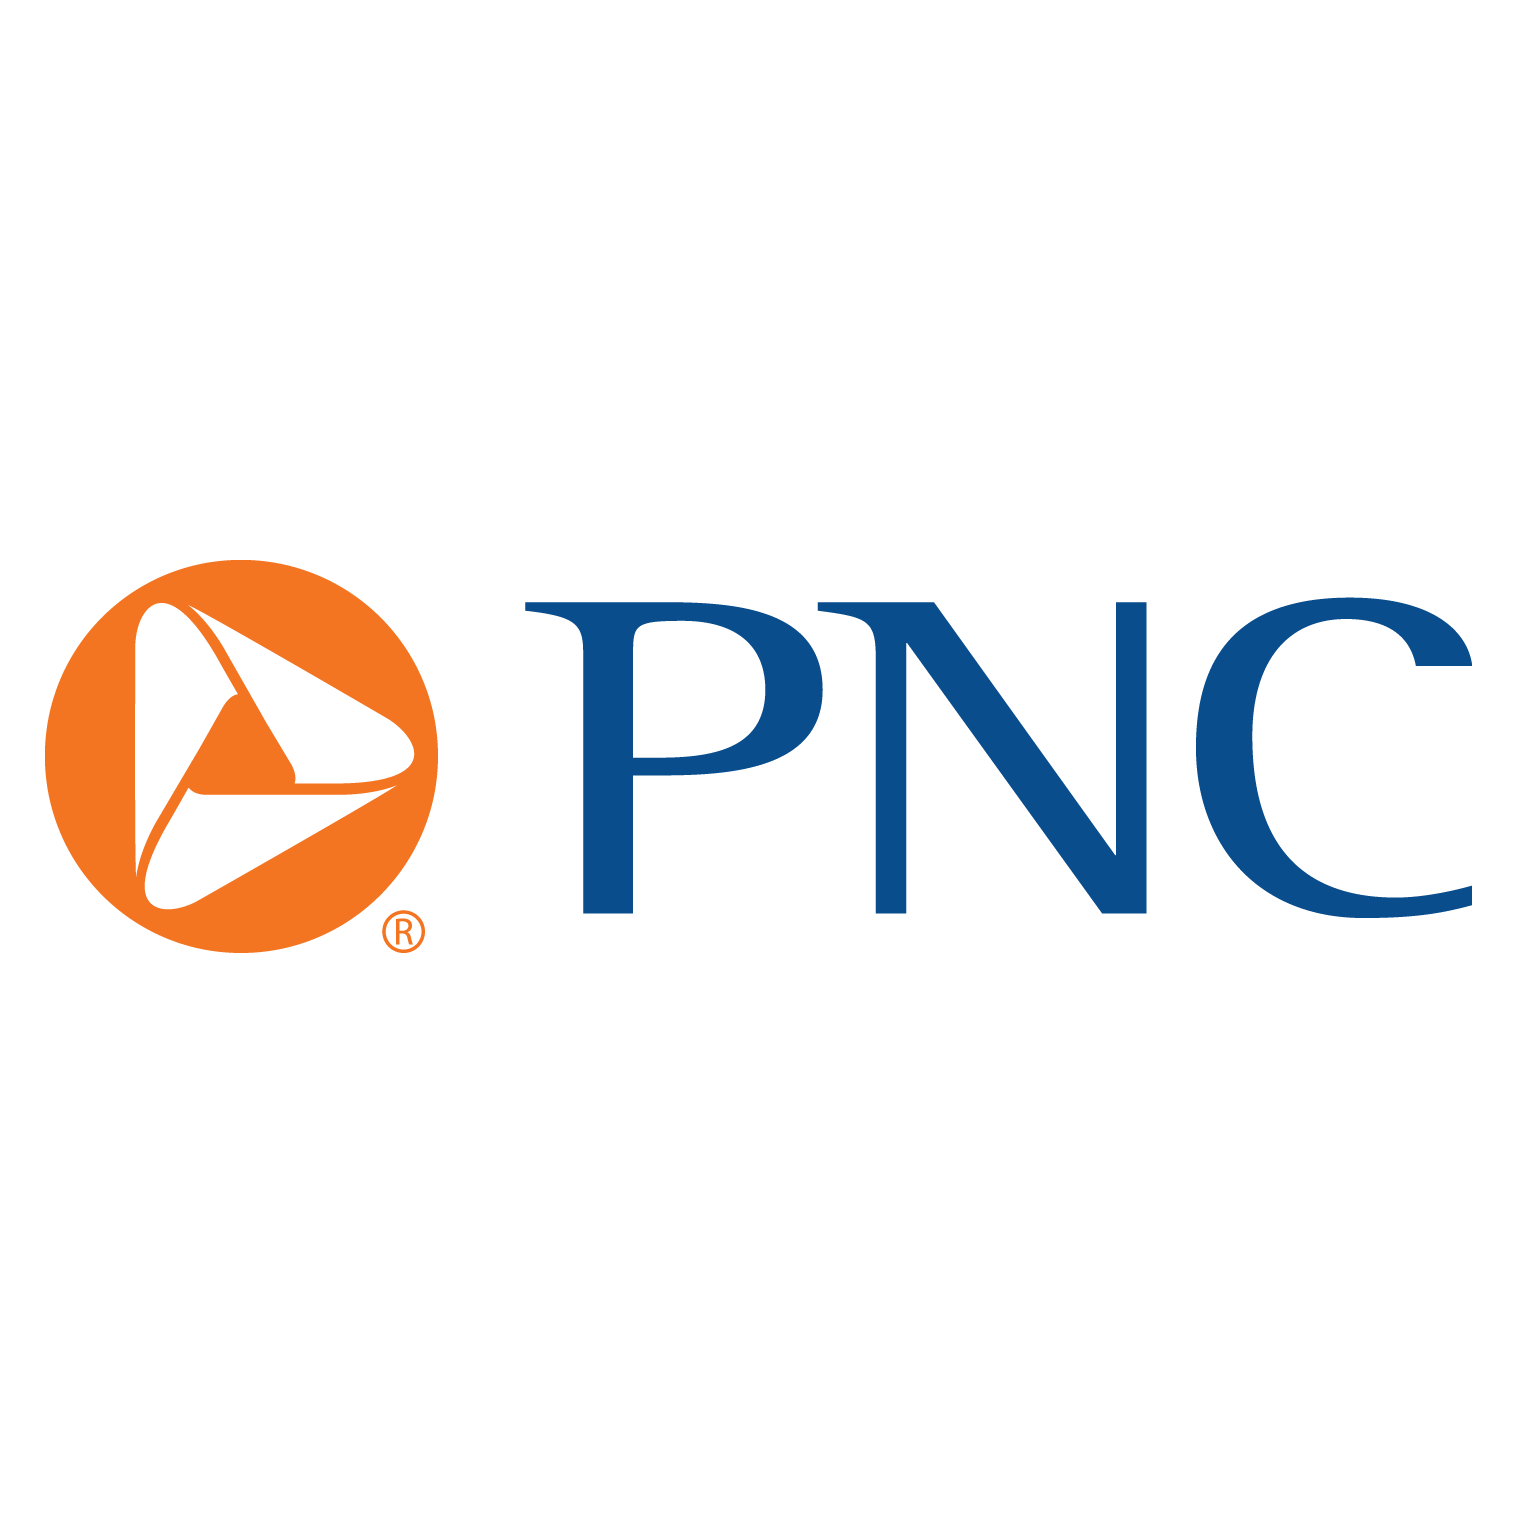 pnc.com-pnc-logologobrand-logoiconslogos-251519939939xtotr